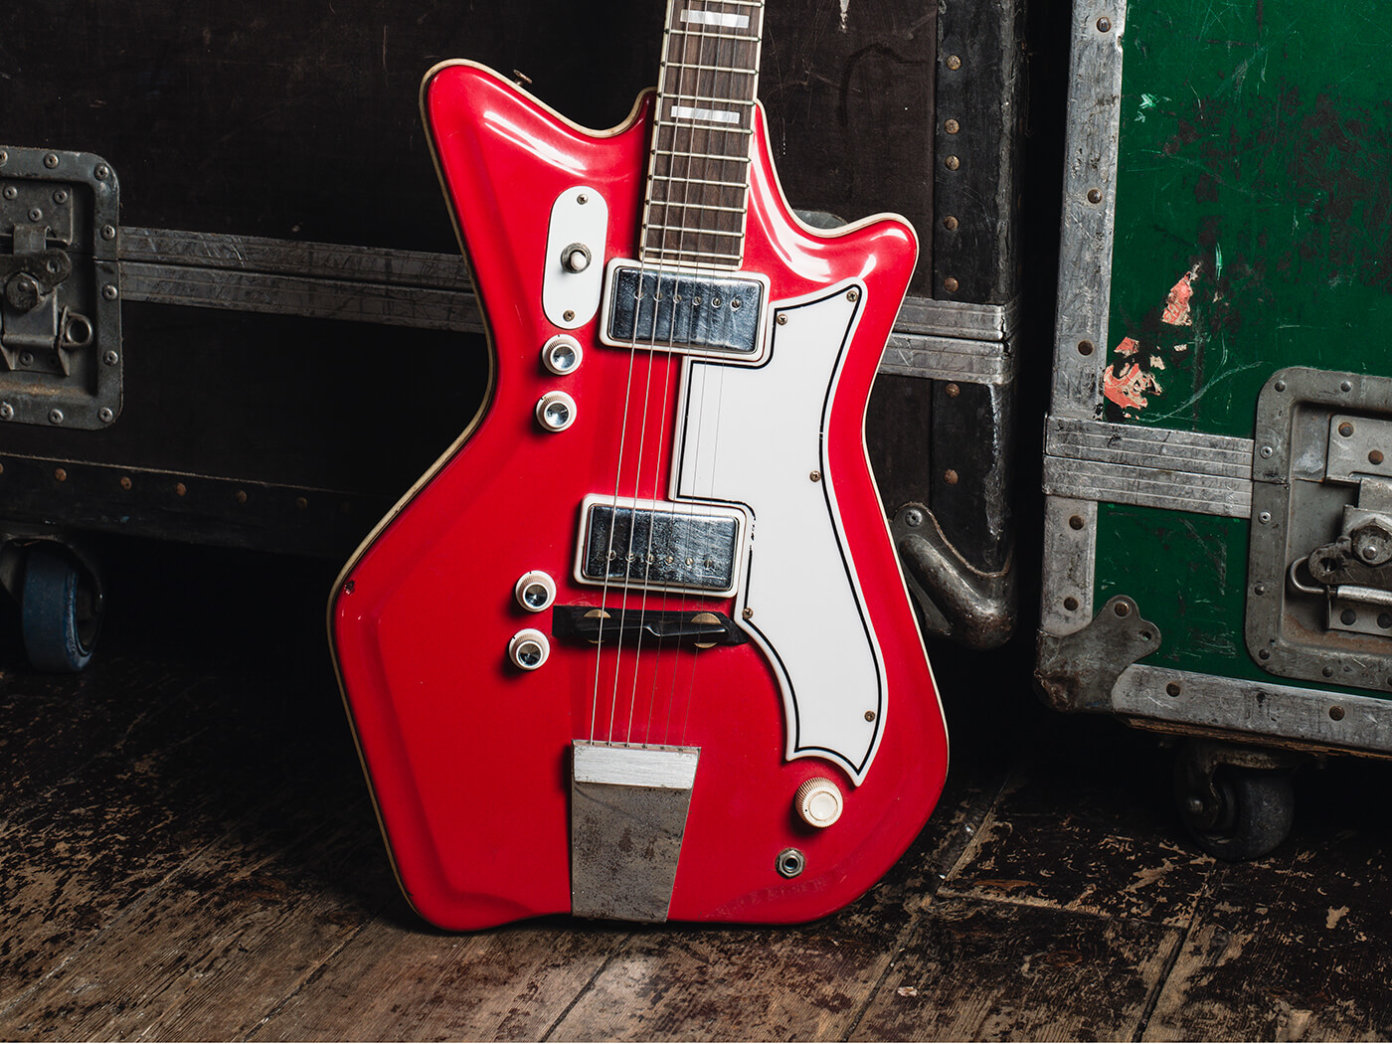 Guitares électriques - Page 12 Rory_national_airline_1@1400x1050-1392x1044